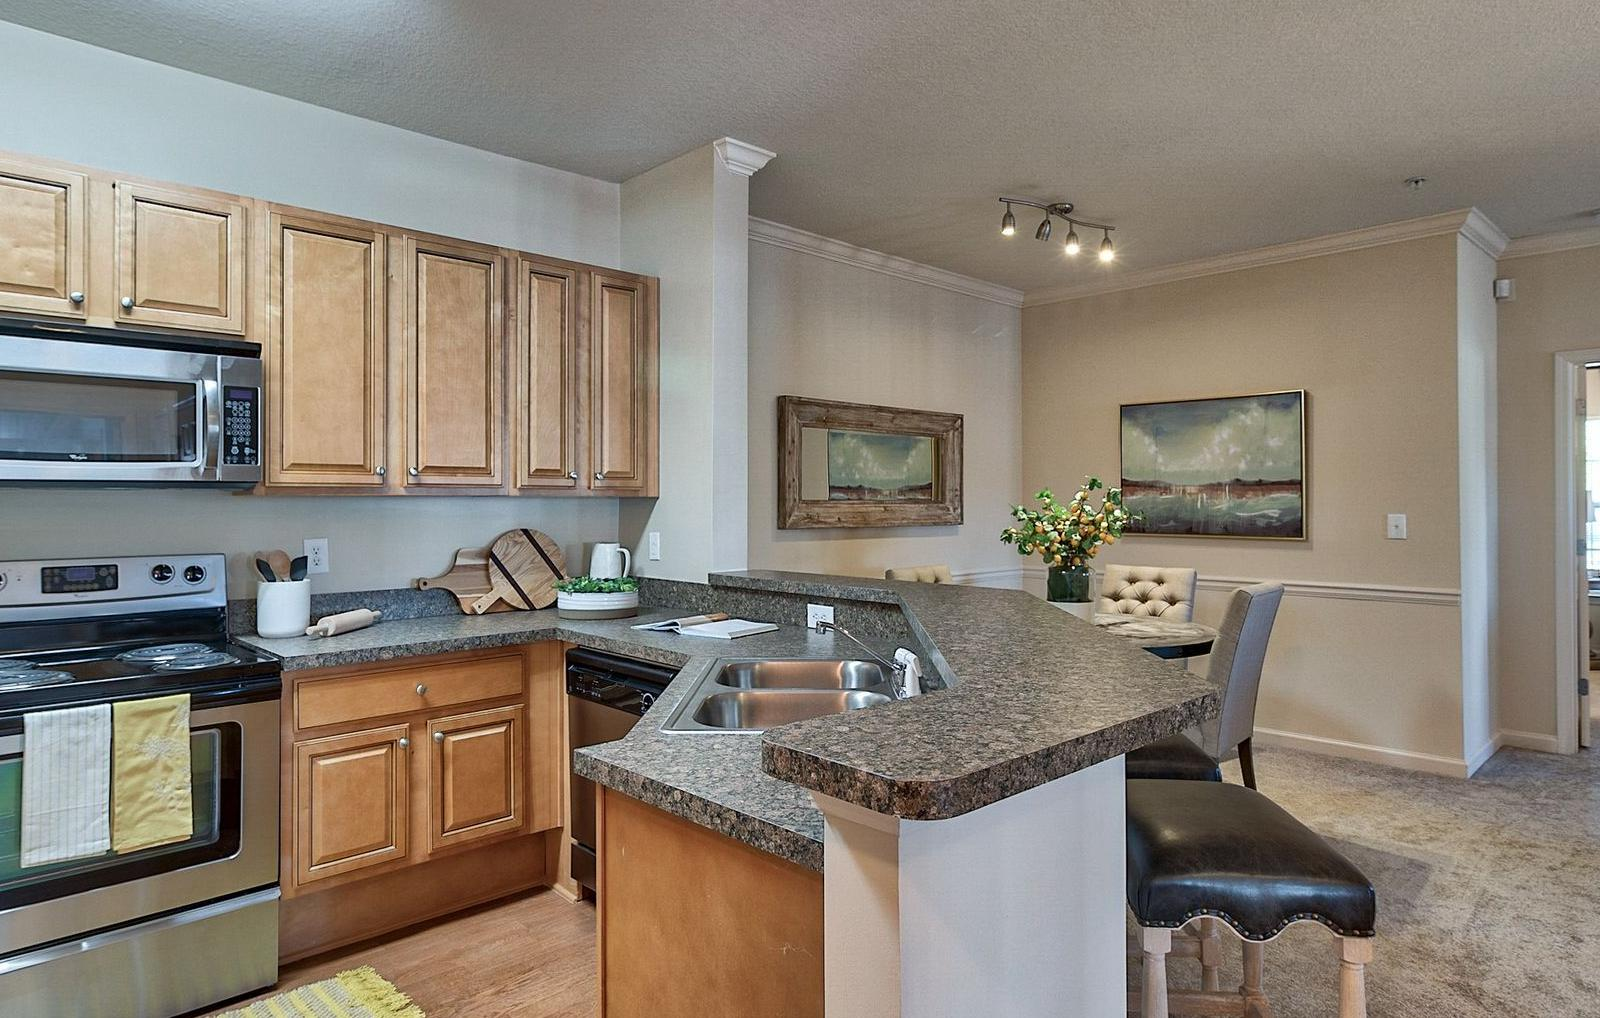 Apartment Rental Amenities in Millbrook, AL | GRANDVIEW